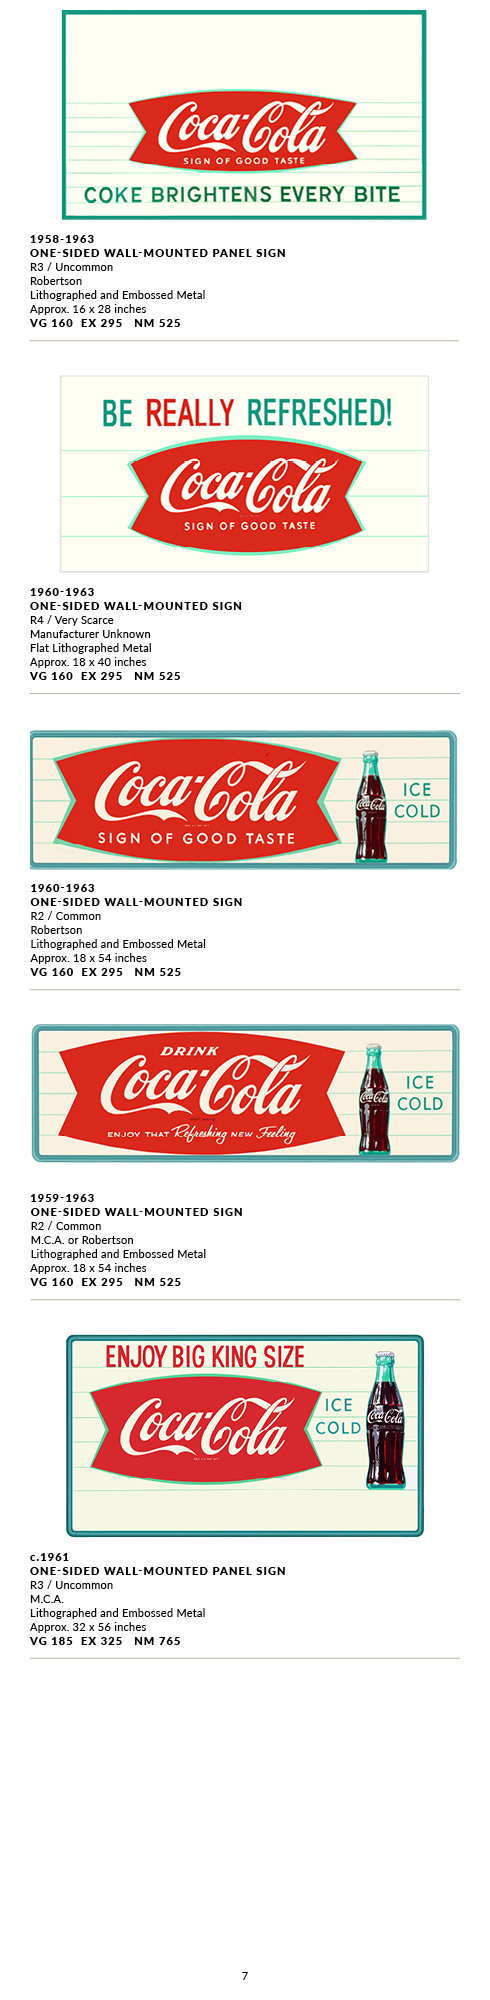 Metal_Signs_1960-1969(2021) copyTEST7.jp